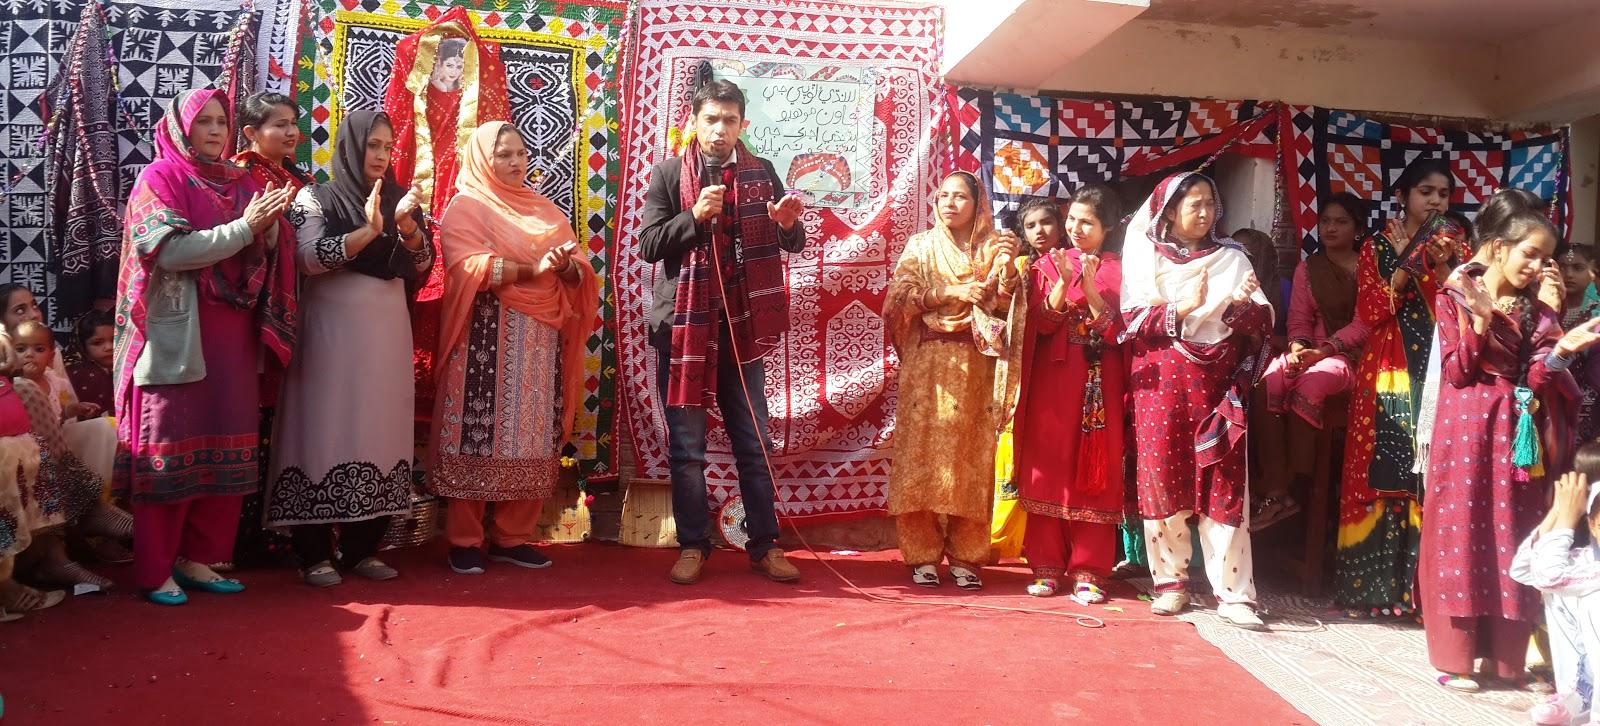 sindhi culture Sindhi topi and ajraksindhi topi and ajrak sindhi topi(cap):sindhi topi(cap): sindhi topi is regarded assindhi topi is regarded as an essential part of sindhian essential part of sindhi culture and symbol ofculture and symbol of sindhi nationalismsindhi nationalism.